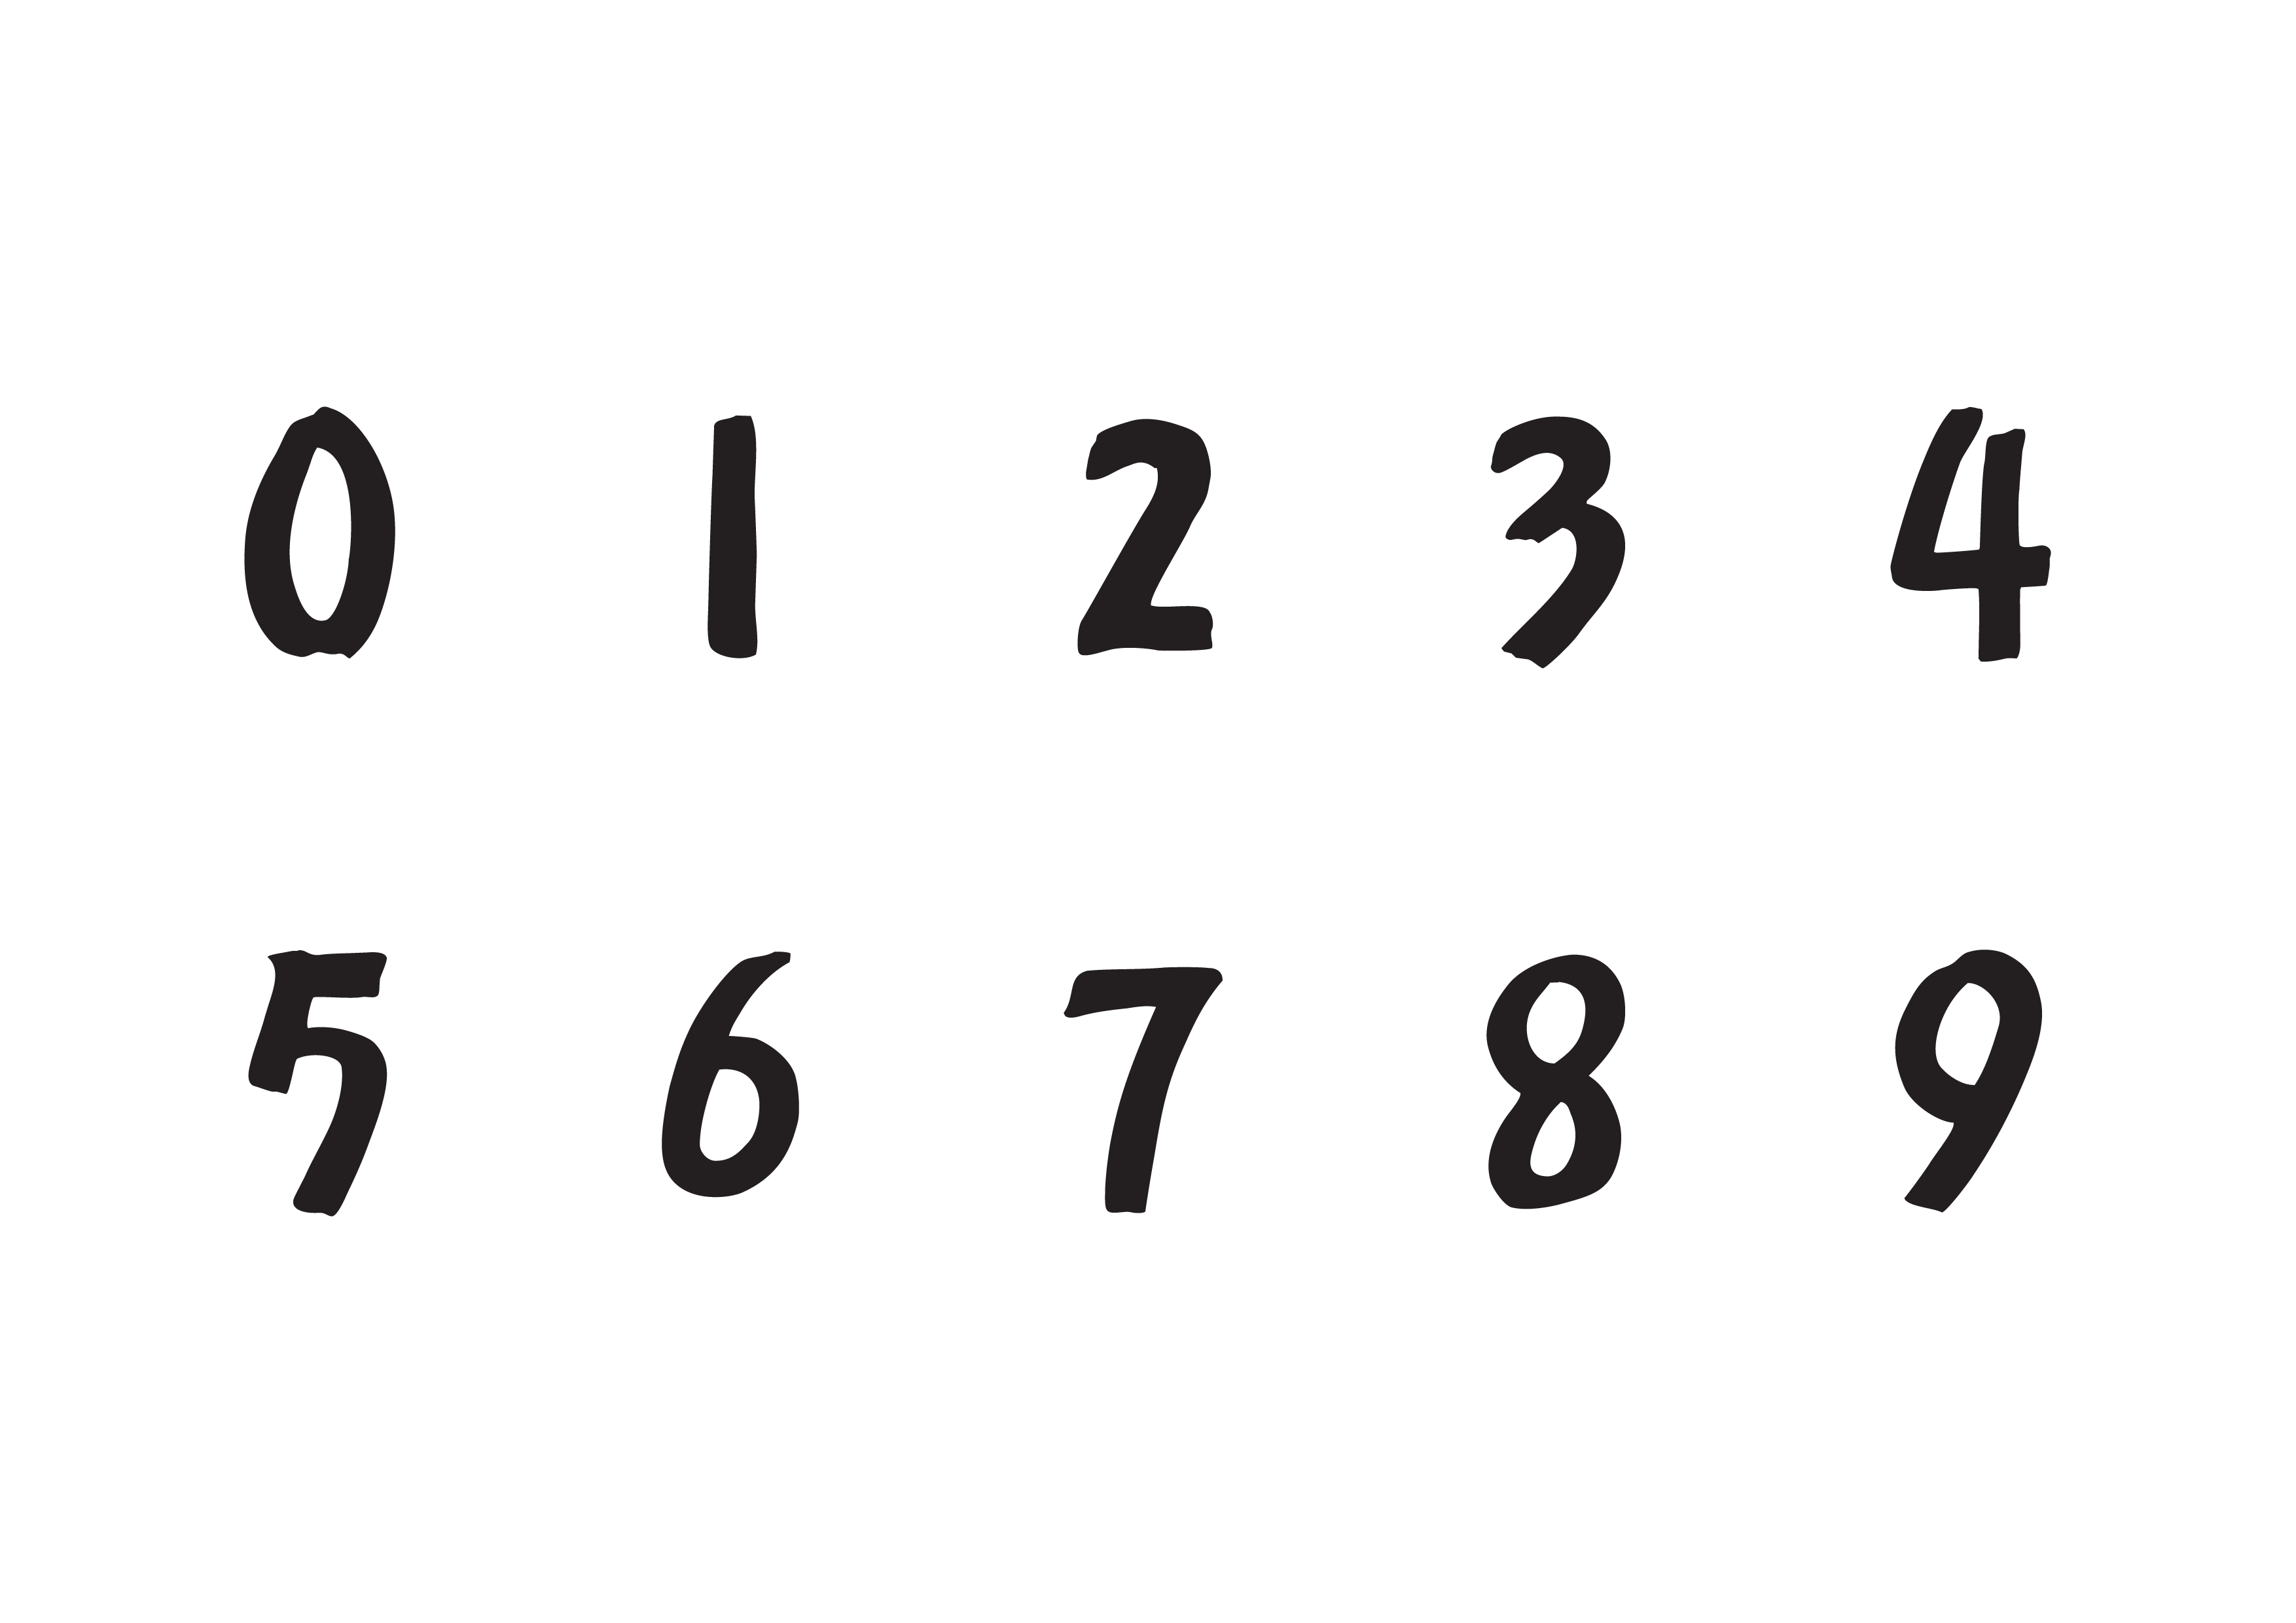 0123456789